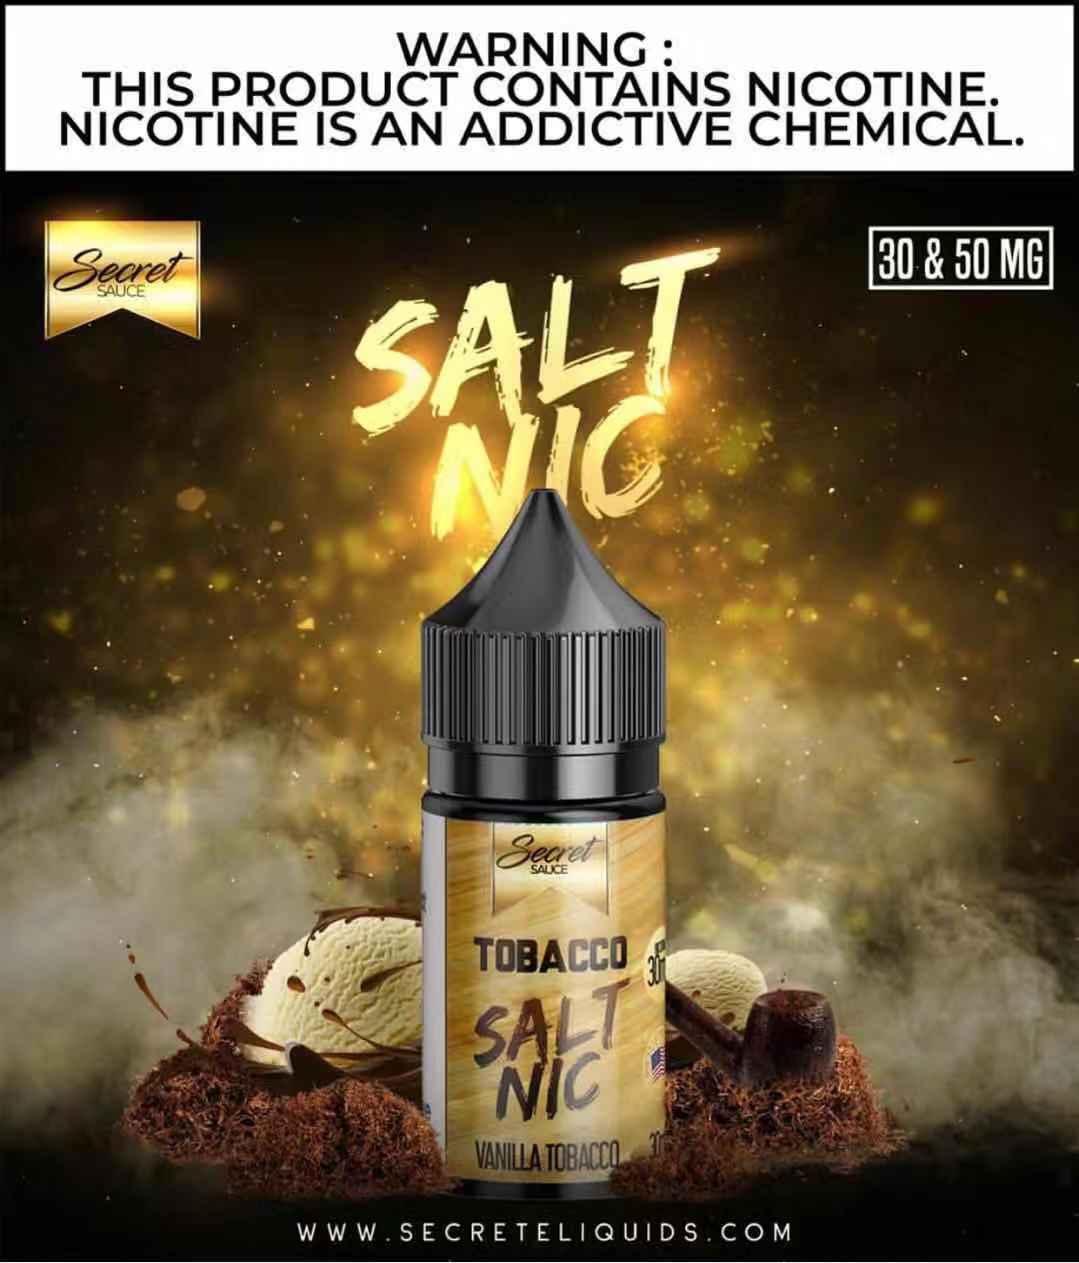 Secret Sauce tobacco Salt Nic oil    1